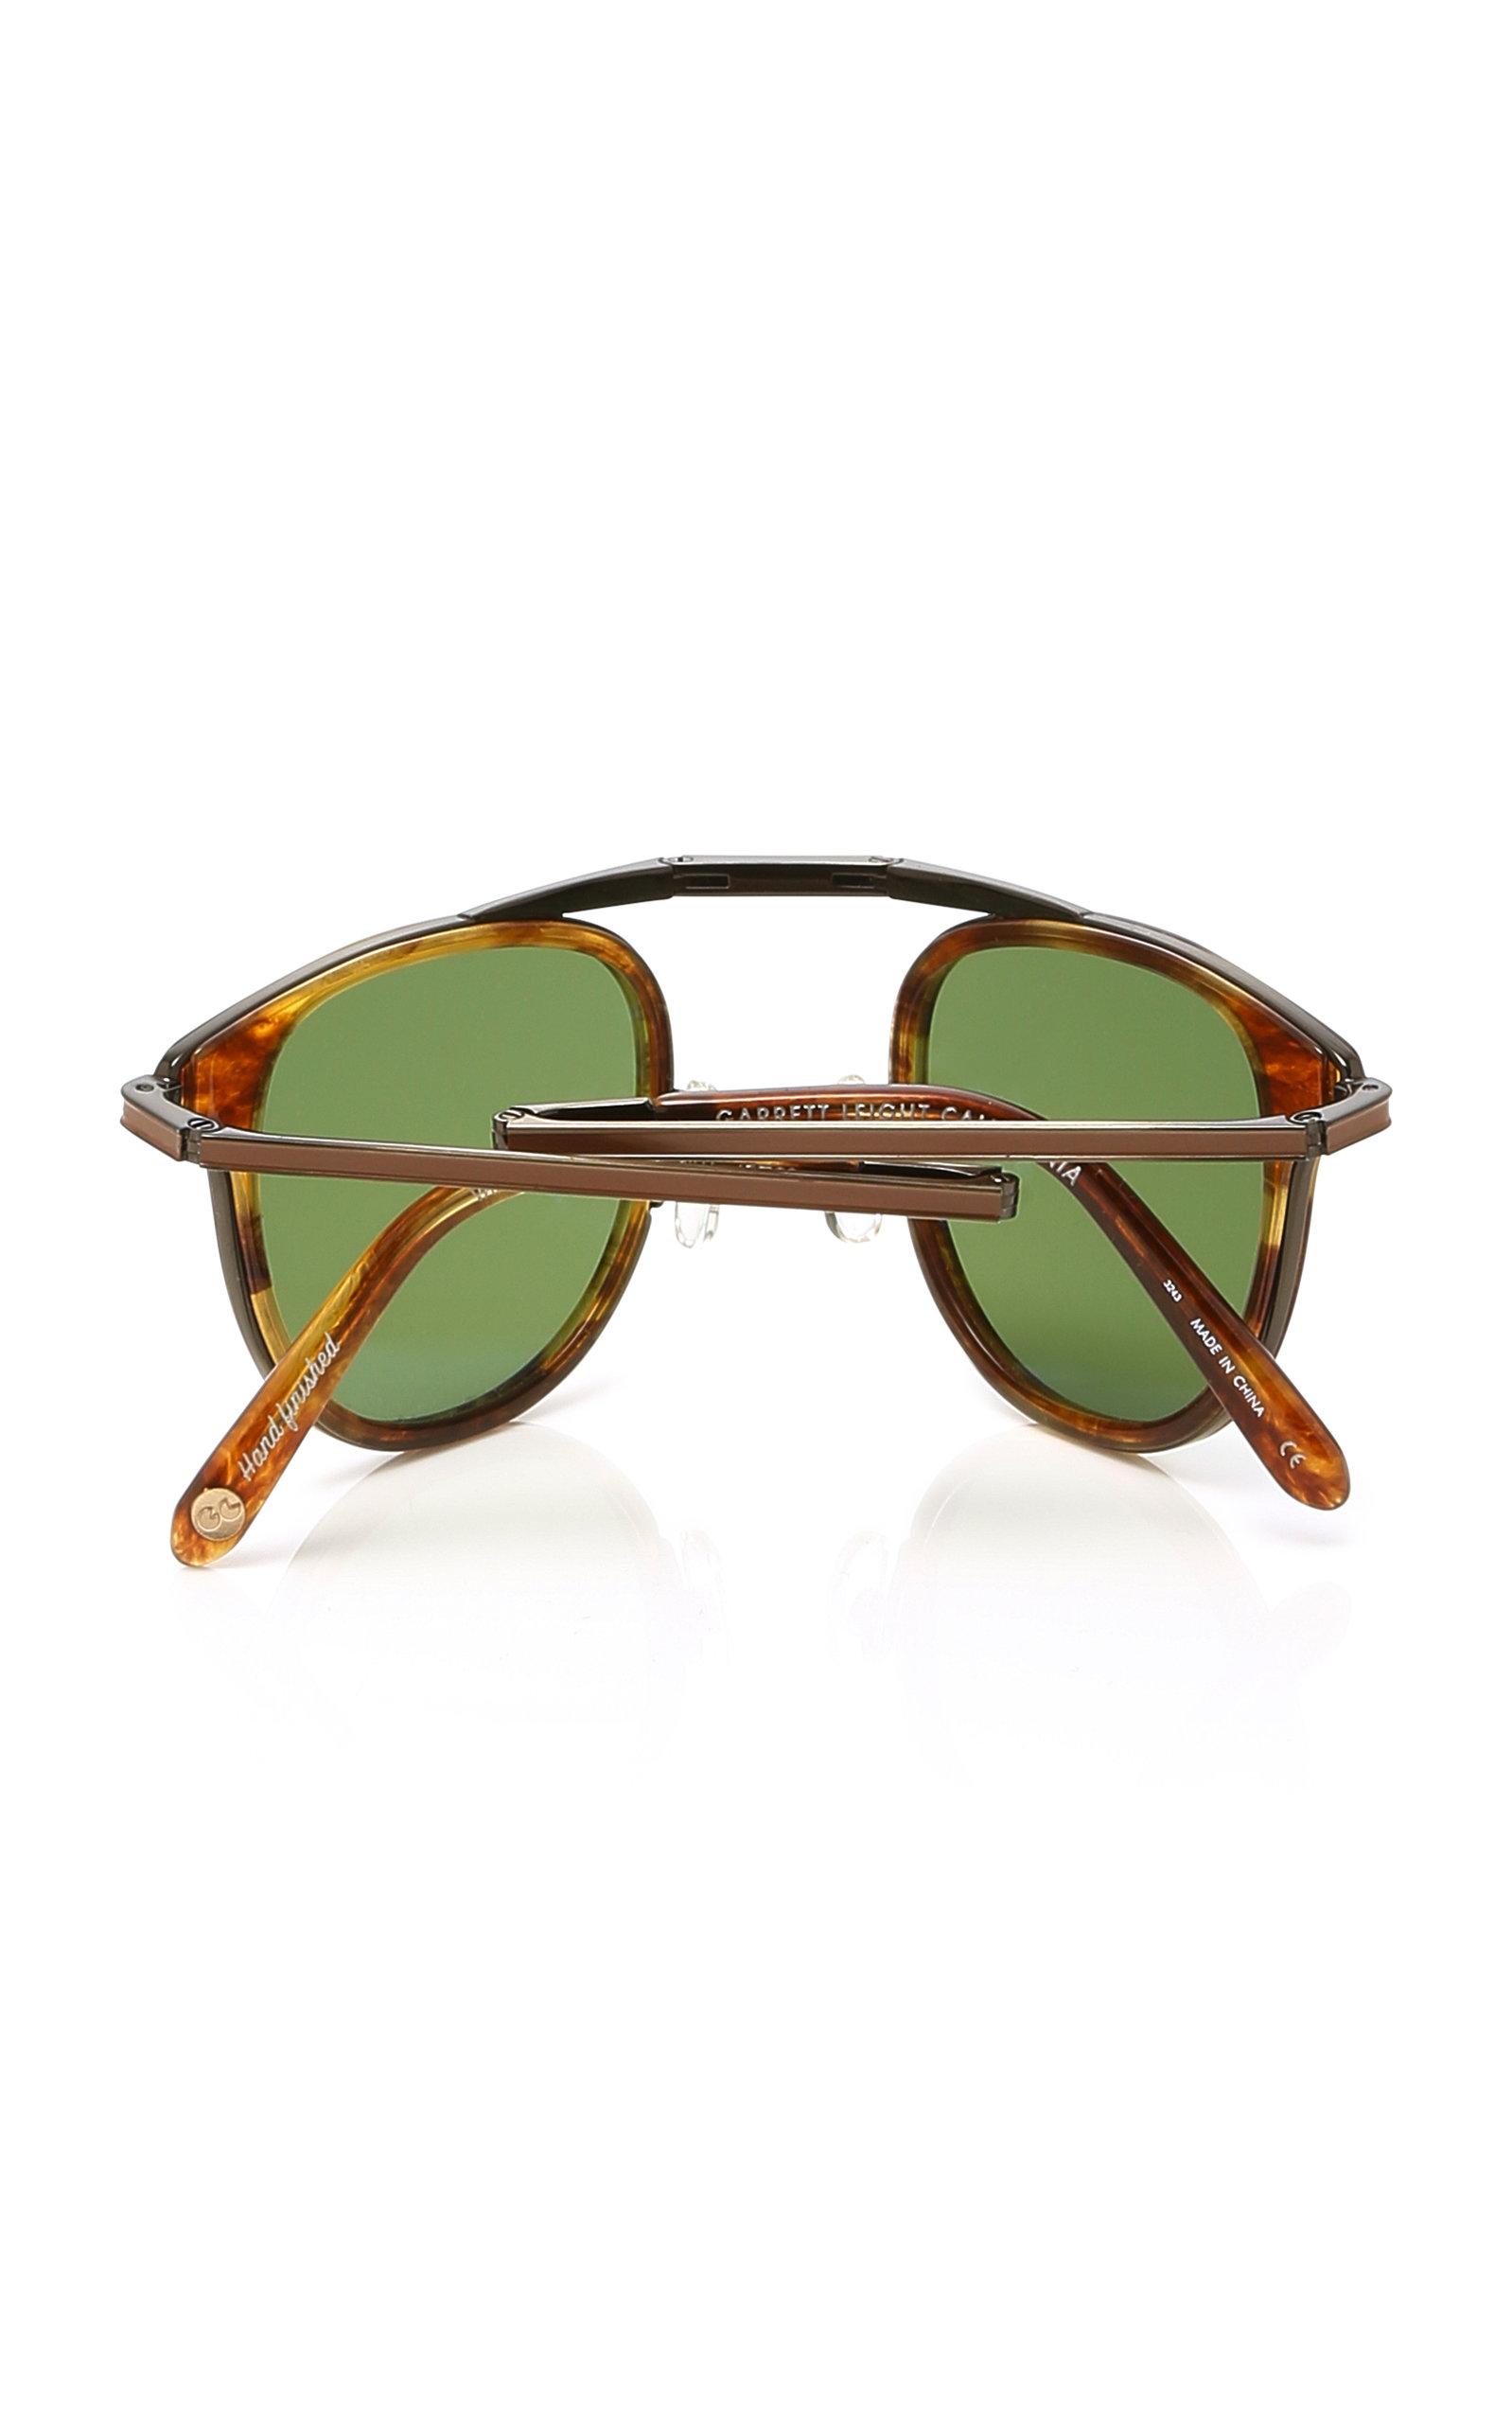 8a37979d552 Operandi Buren Garrett Van By Frame Sunglasses Acetate Moda Square HT8TqR